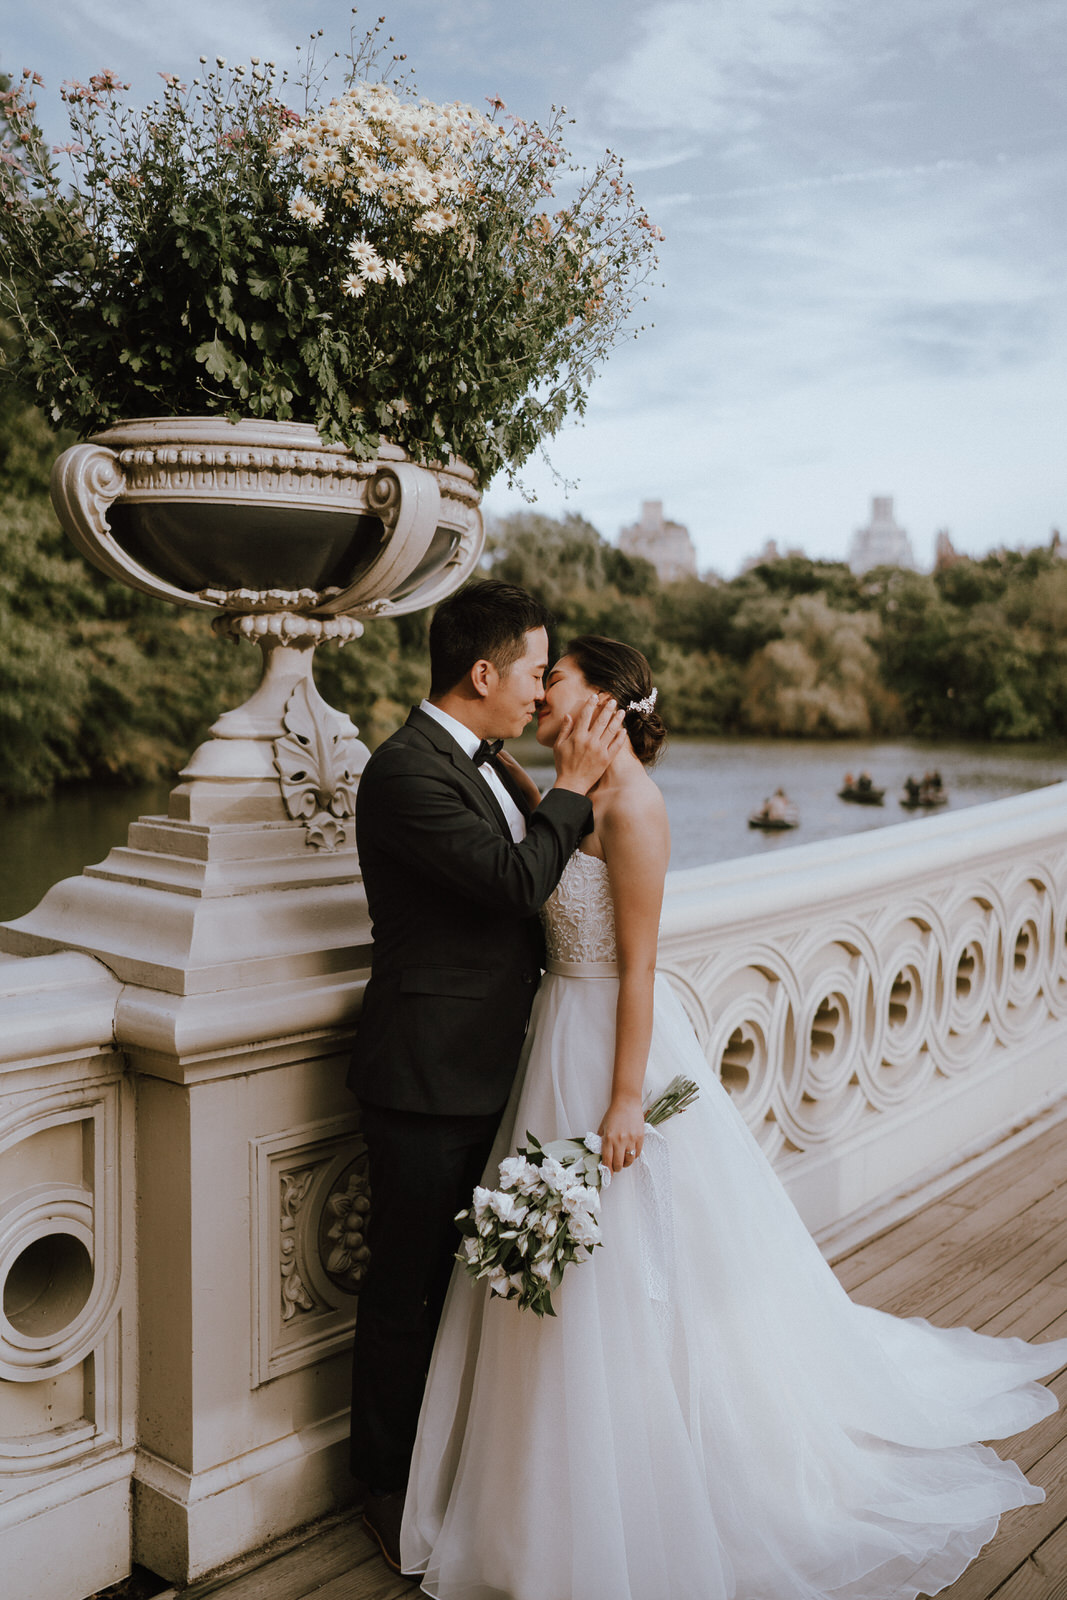 Central Park Elopement Photos-Bow Bridge-Michelle Gonzalez Photography- New York Wedding Photographer-14.jpg